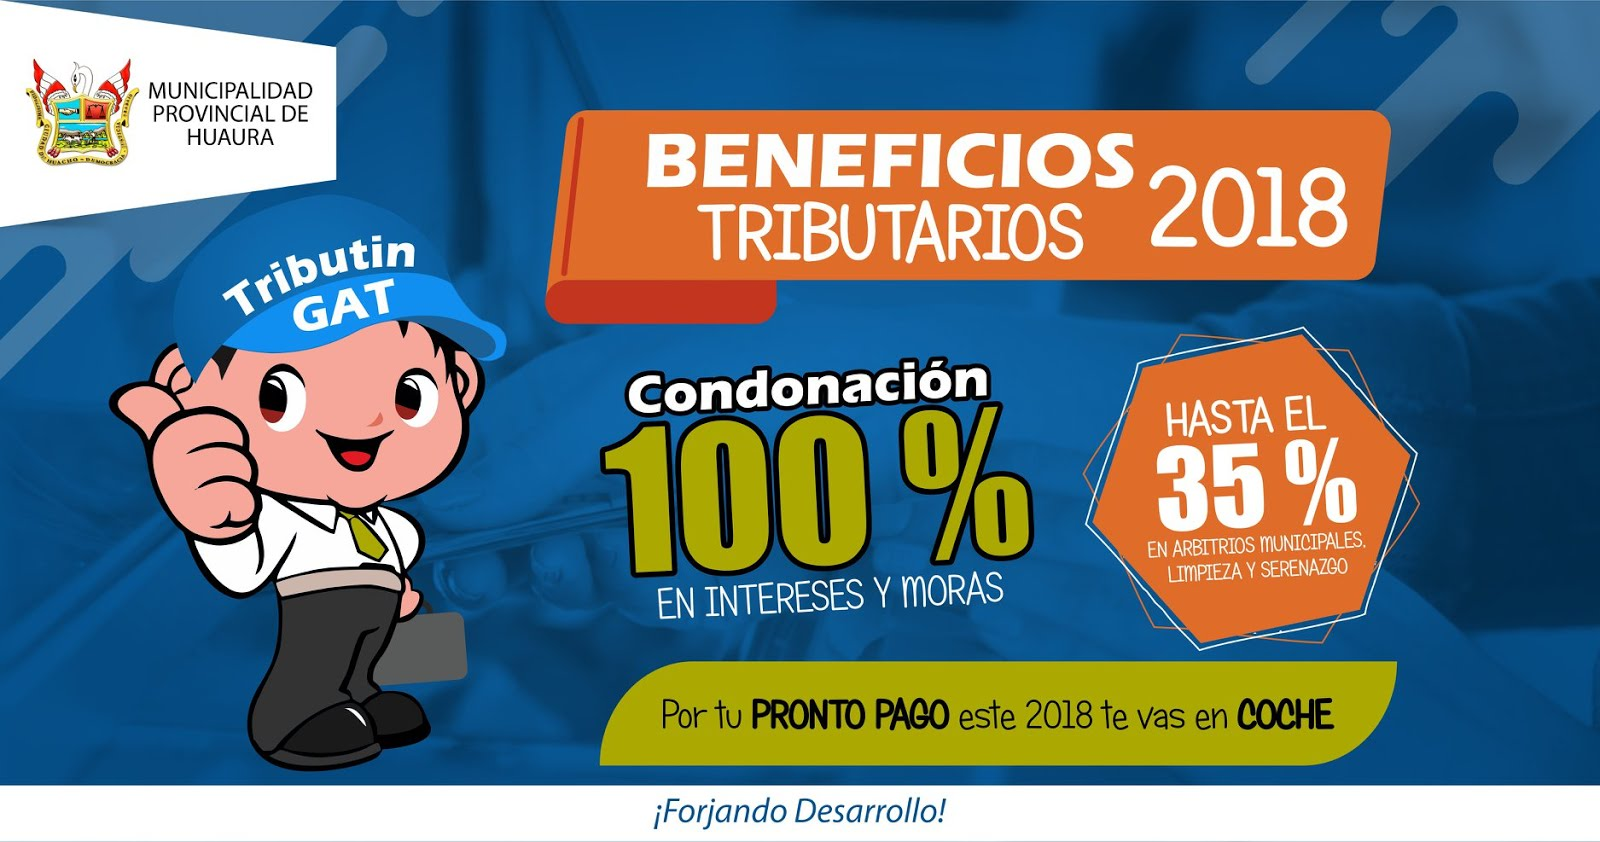 MUNICIPALIDAD PROVINCIAL DE HUAURA